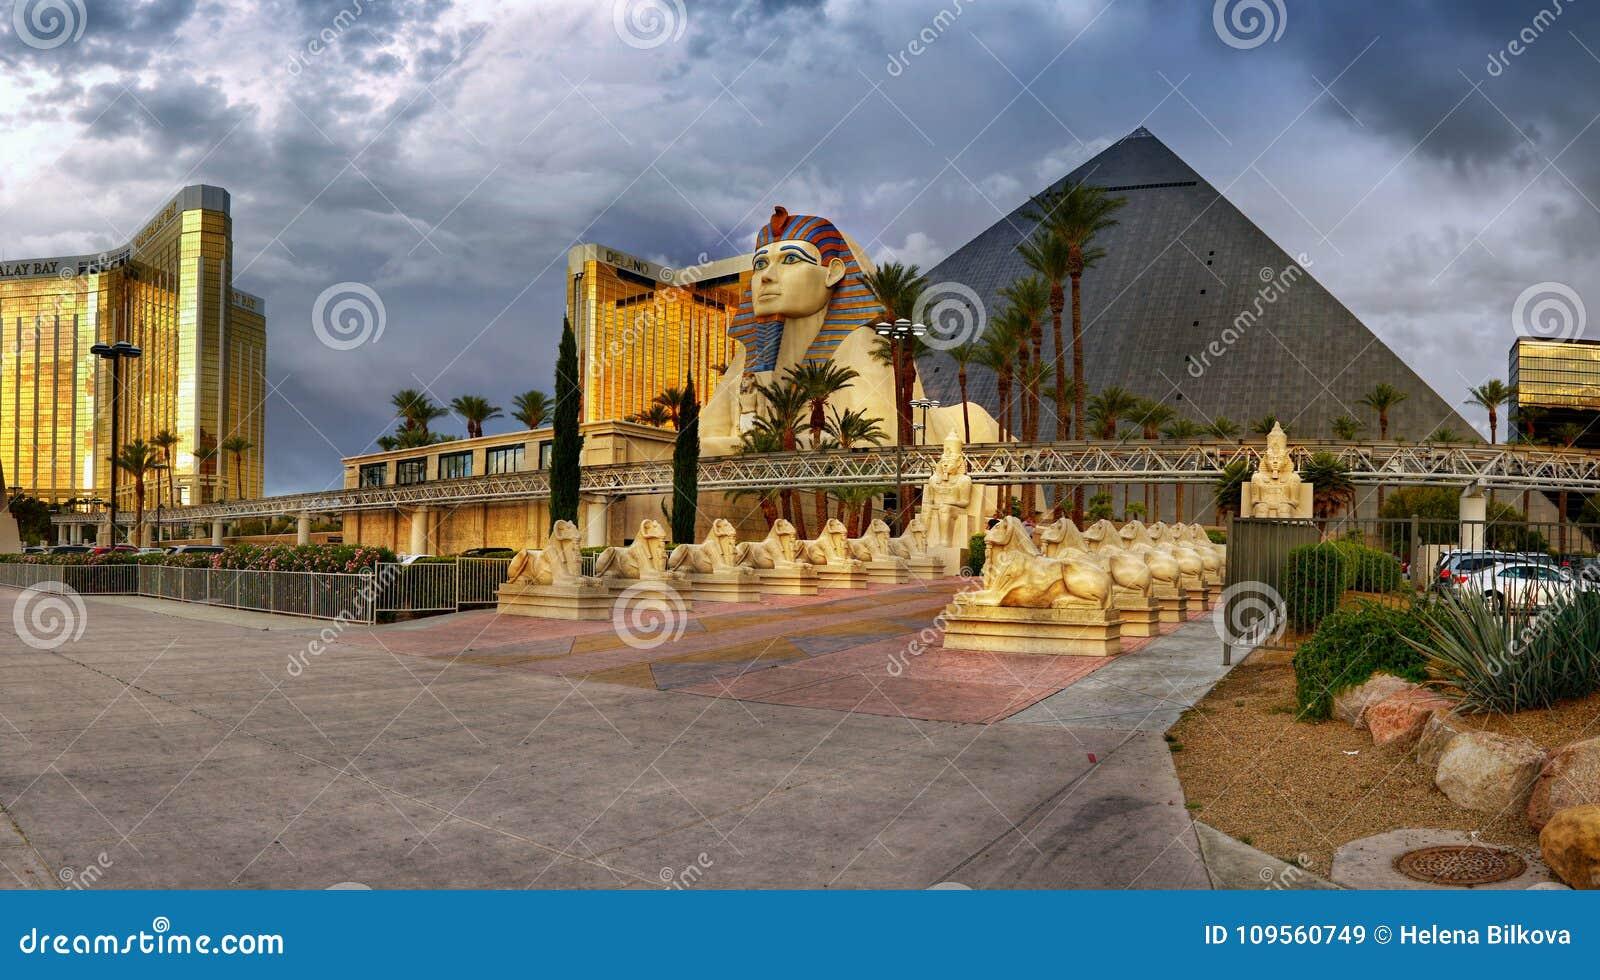 Las Vegas Strip Luxor Hotel Casino Pyramid Sphinx Editorial Stock